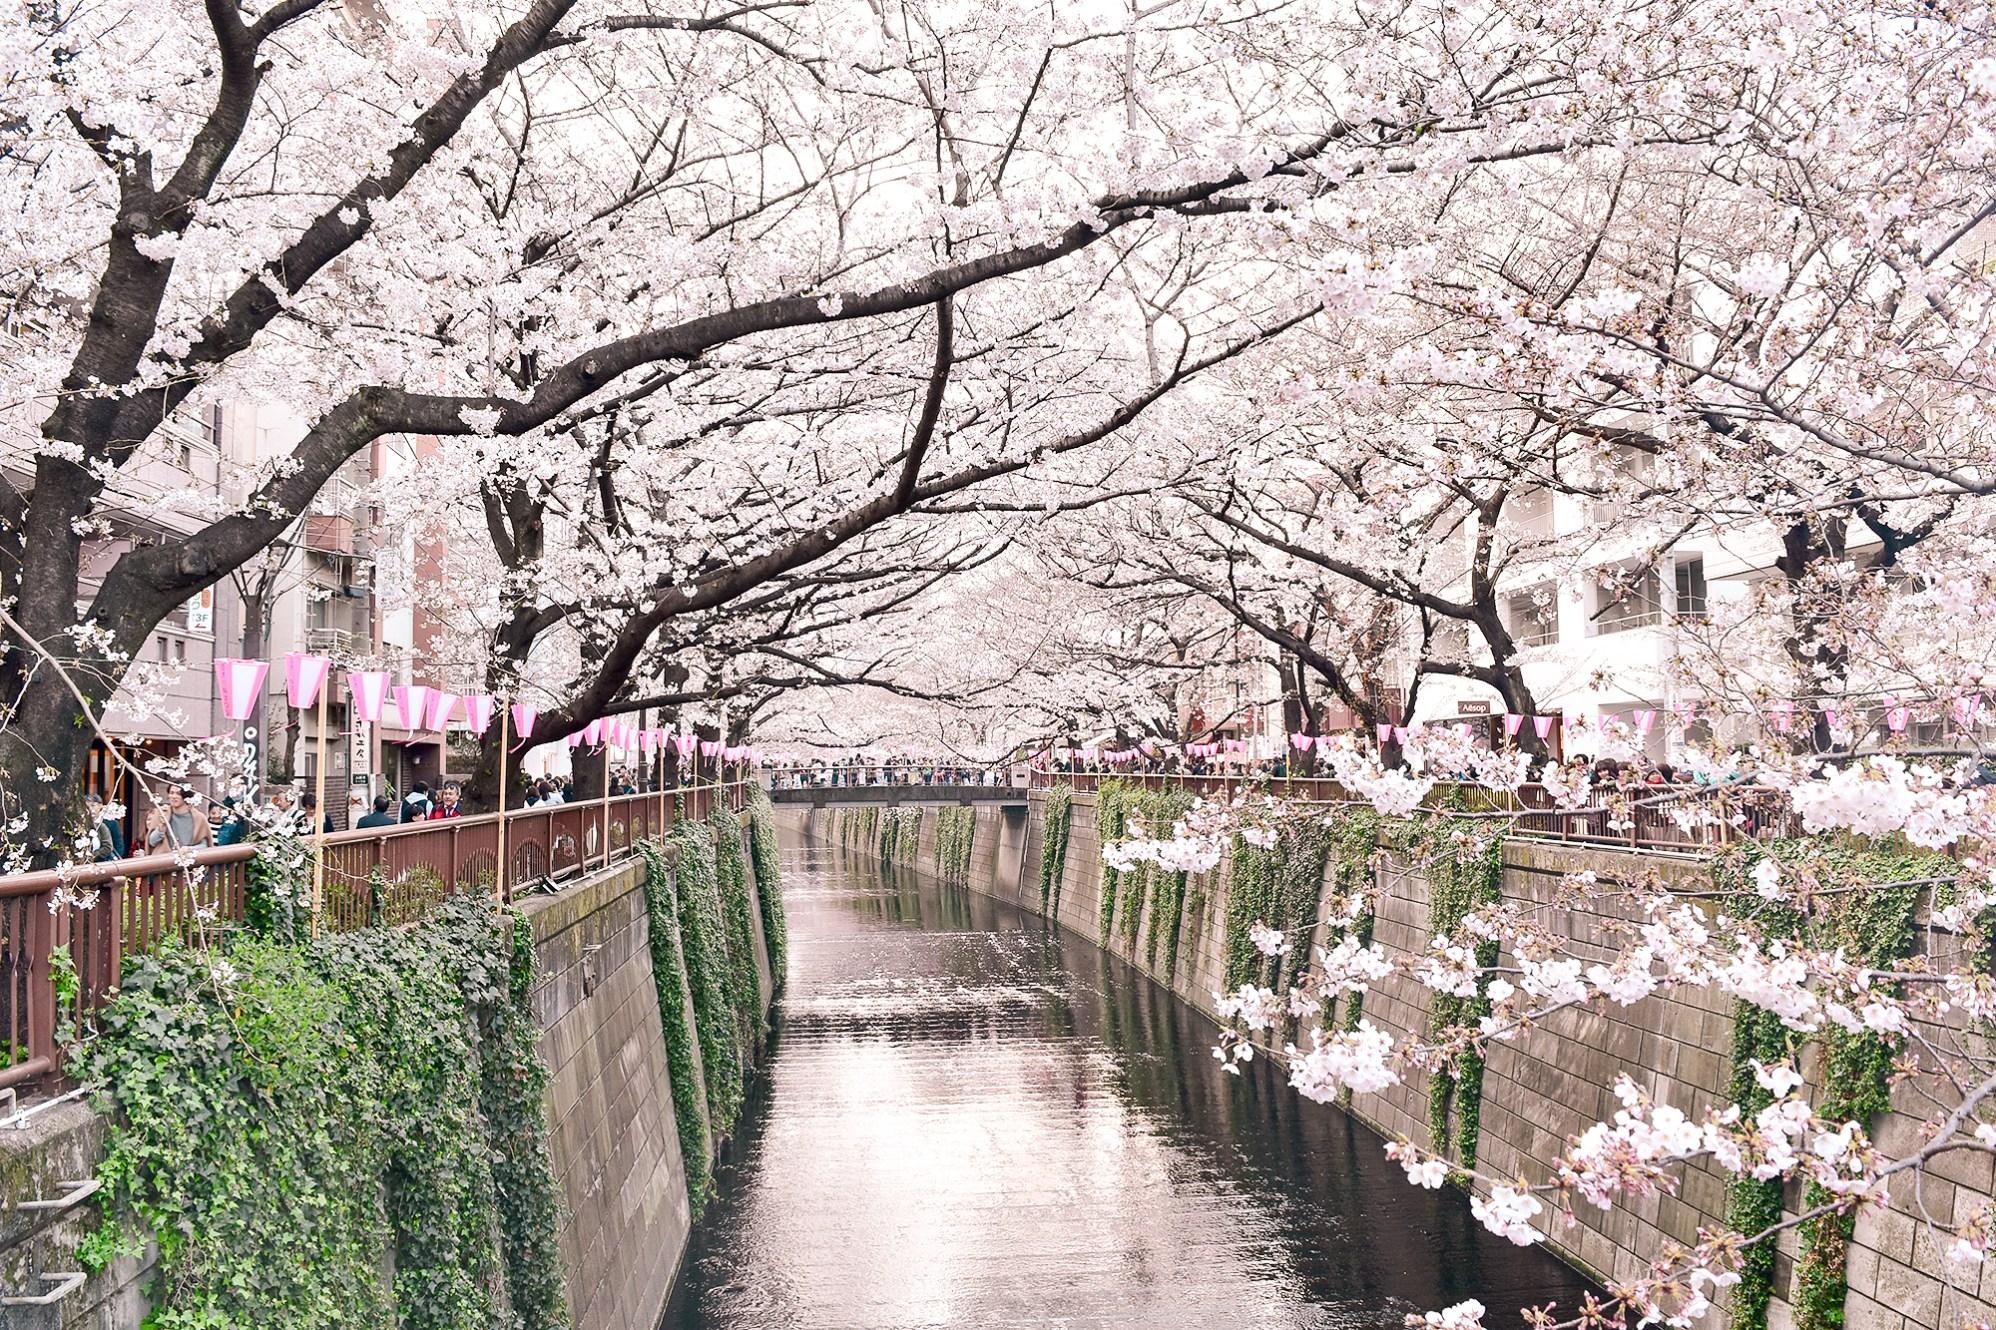 Cherry Blossoms along Meguro River